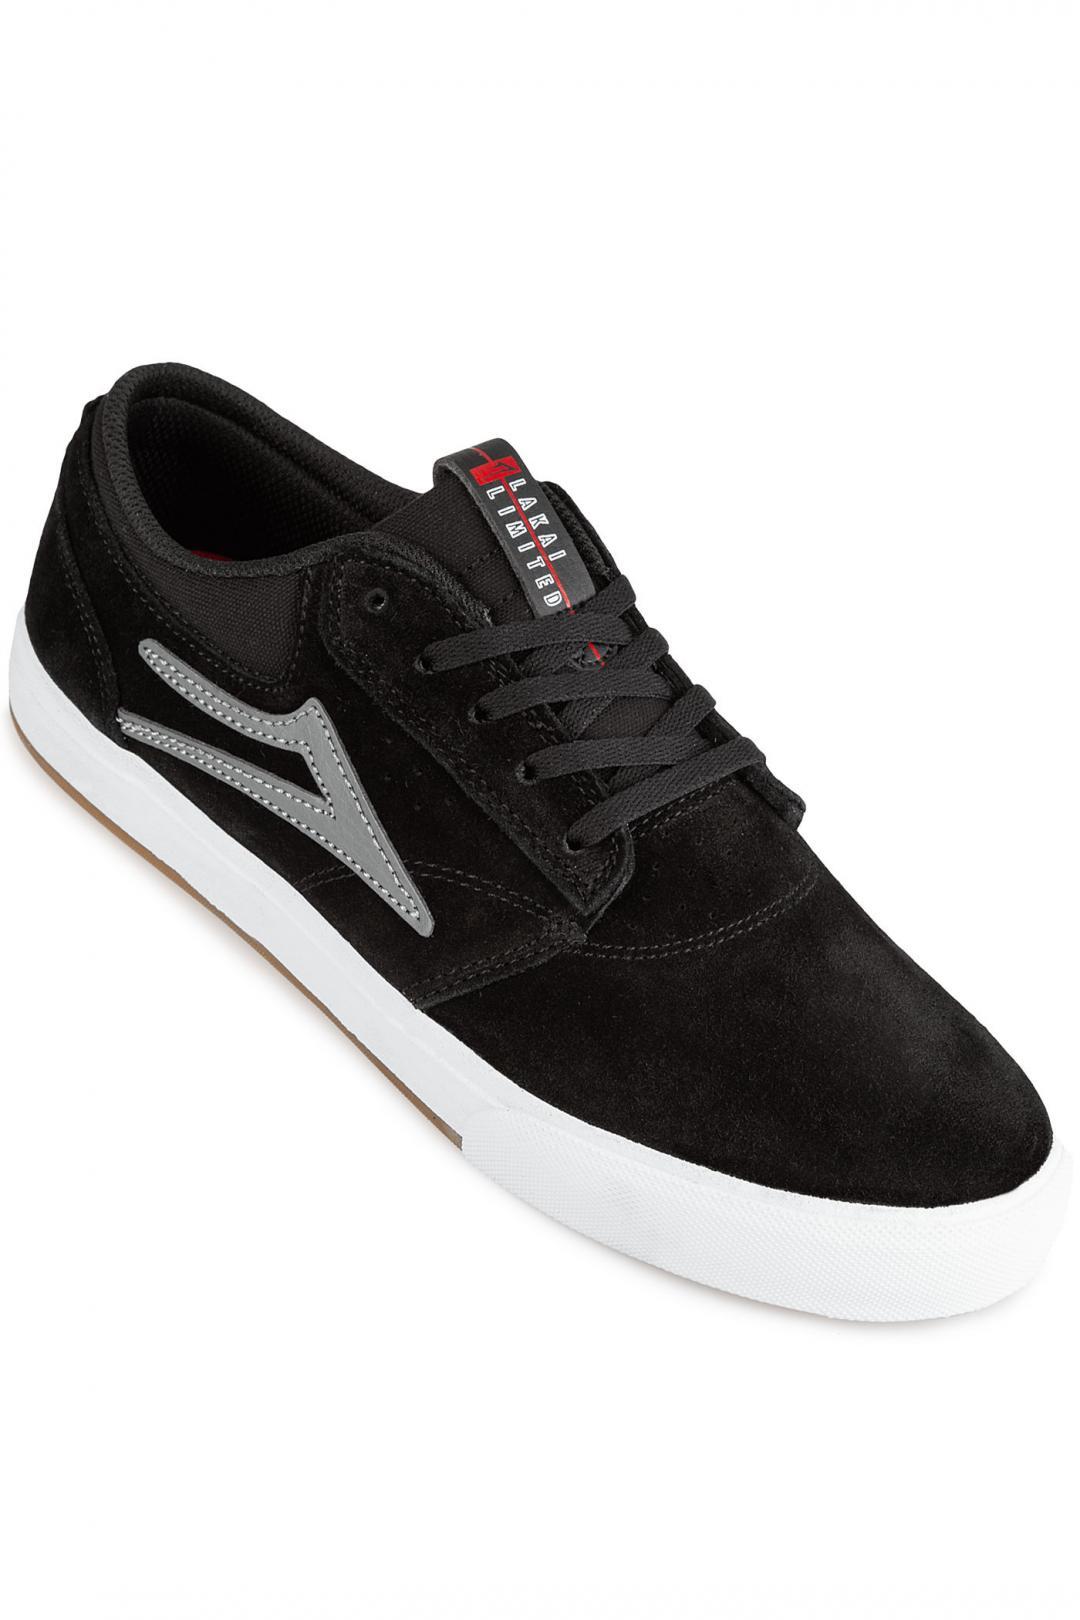 Uomo Lakai Griffin Suede black grey 2 | Sneakers low top